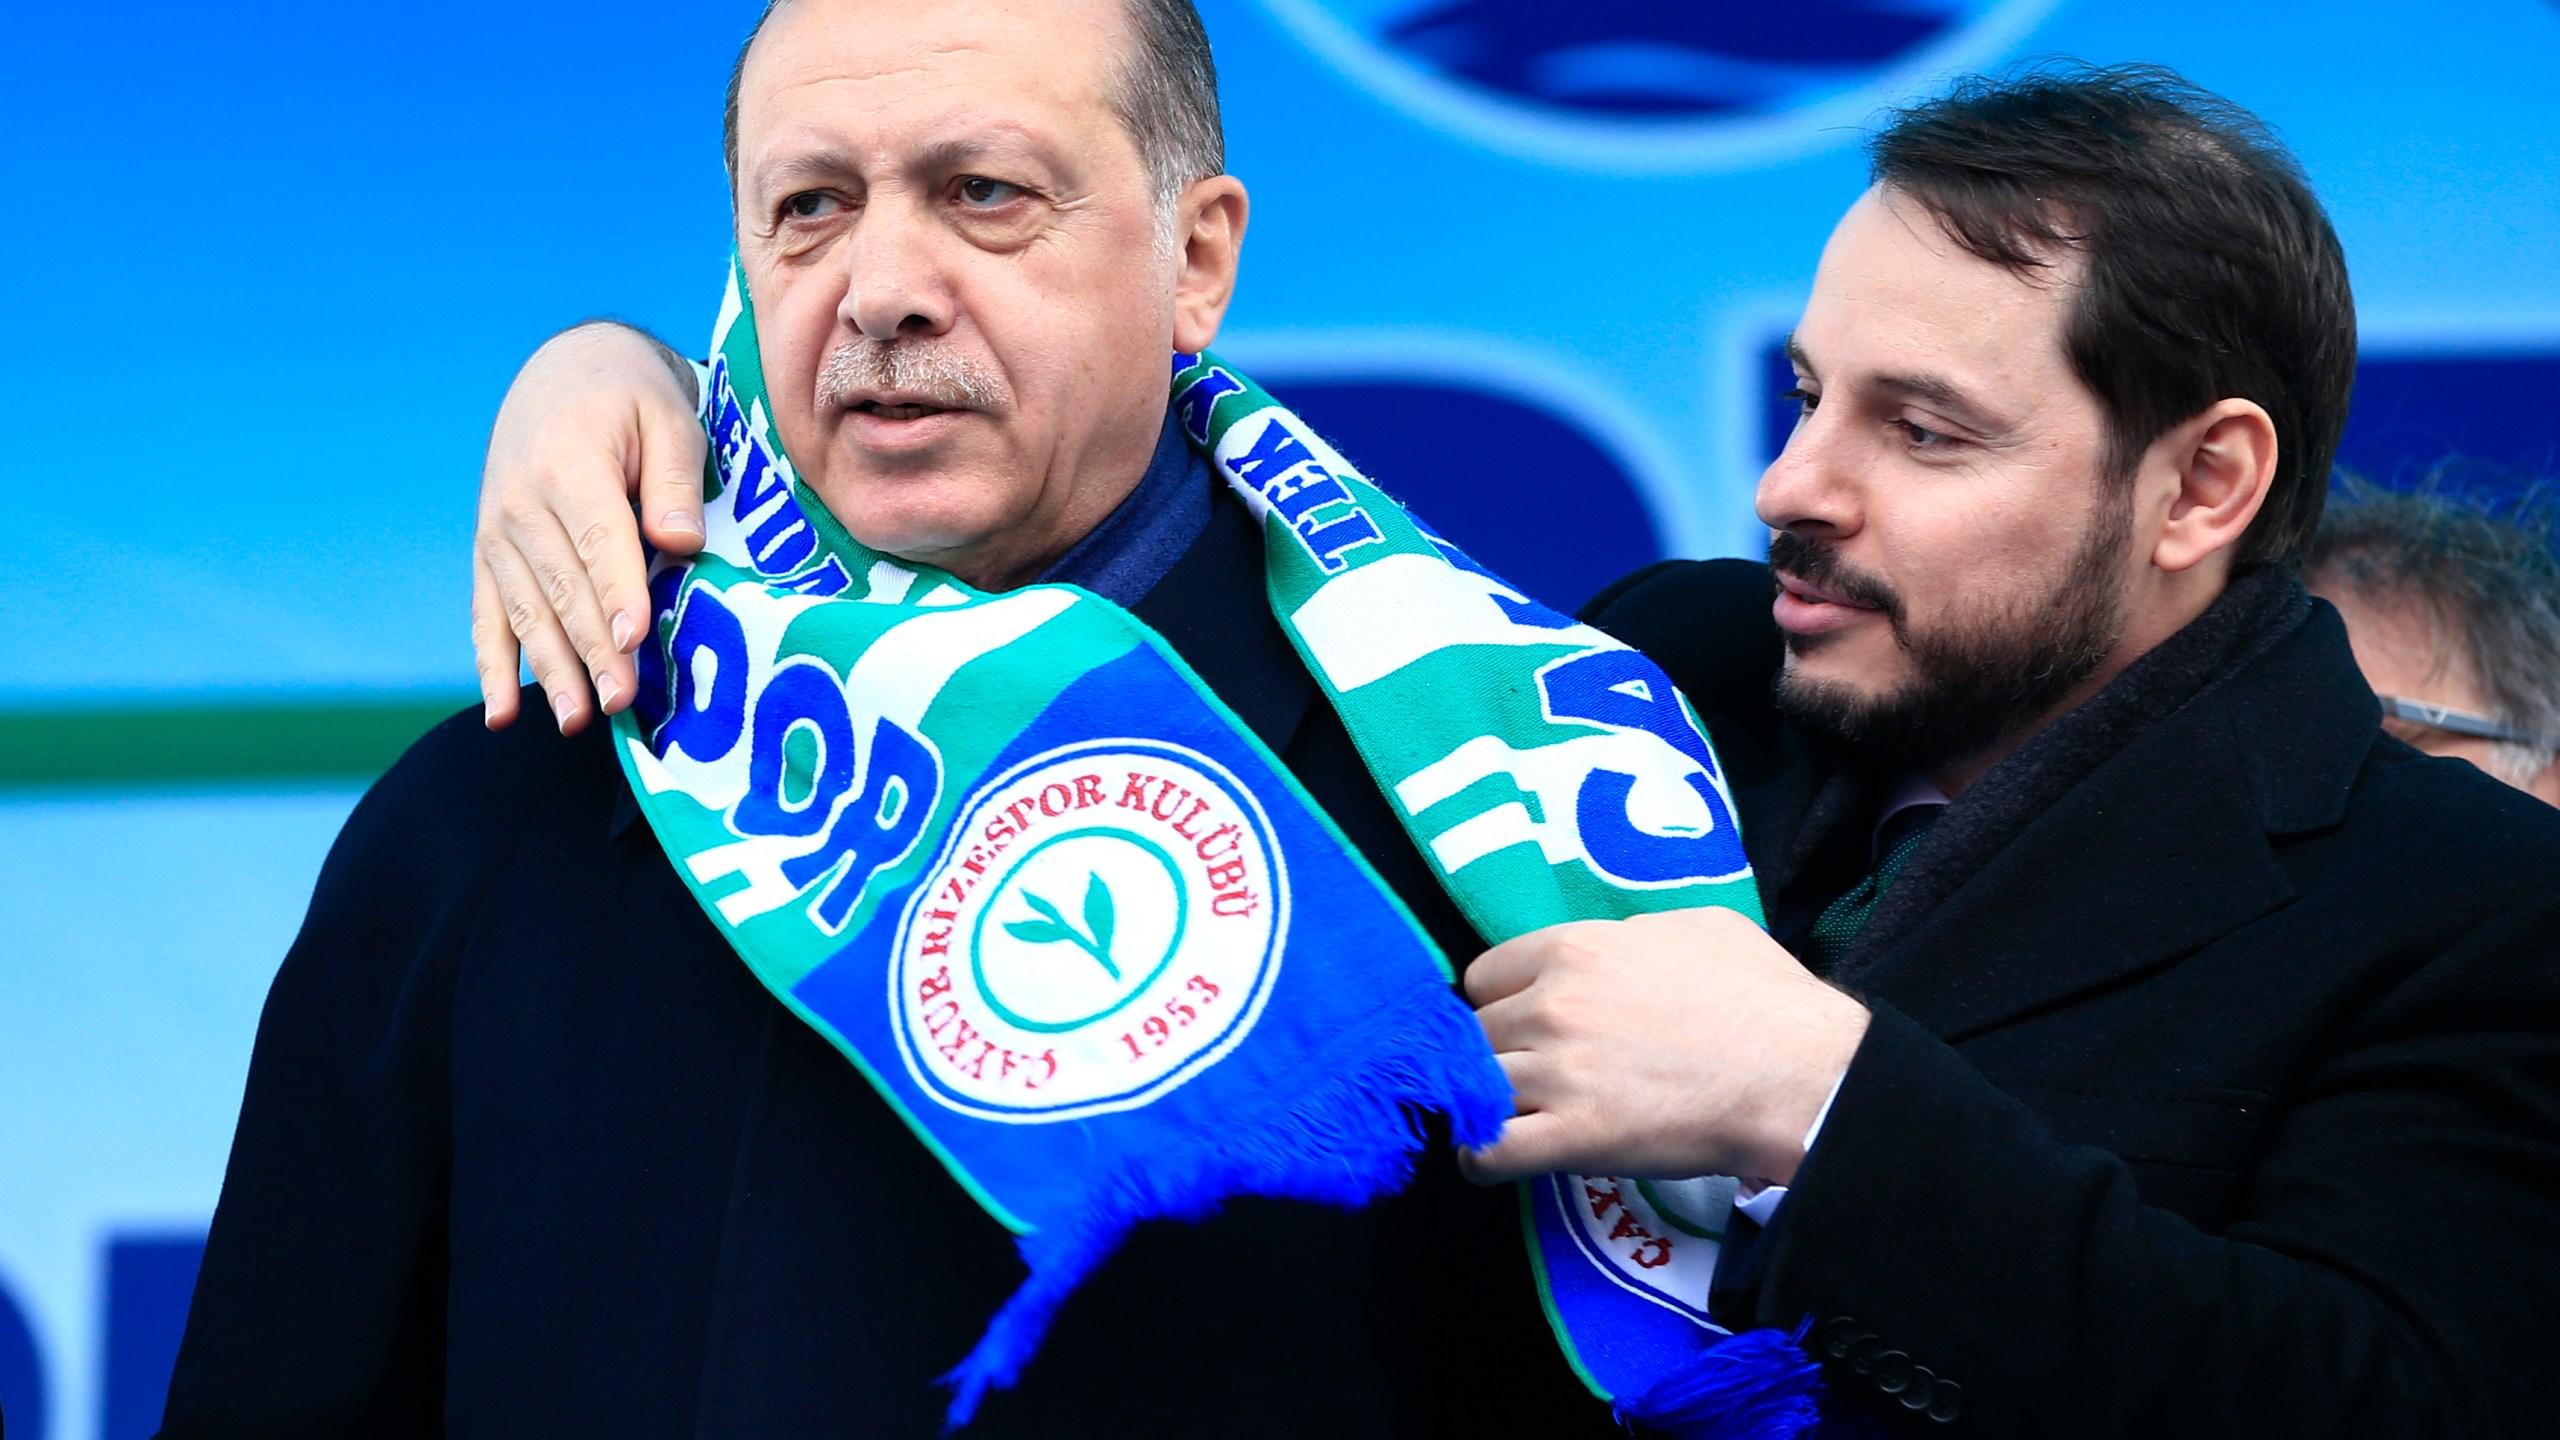 Recep Tayyip Erdogan, Berat Albayrak